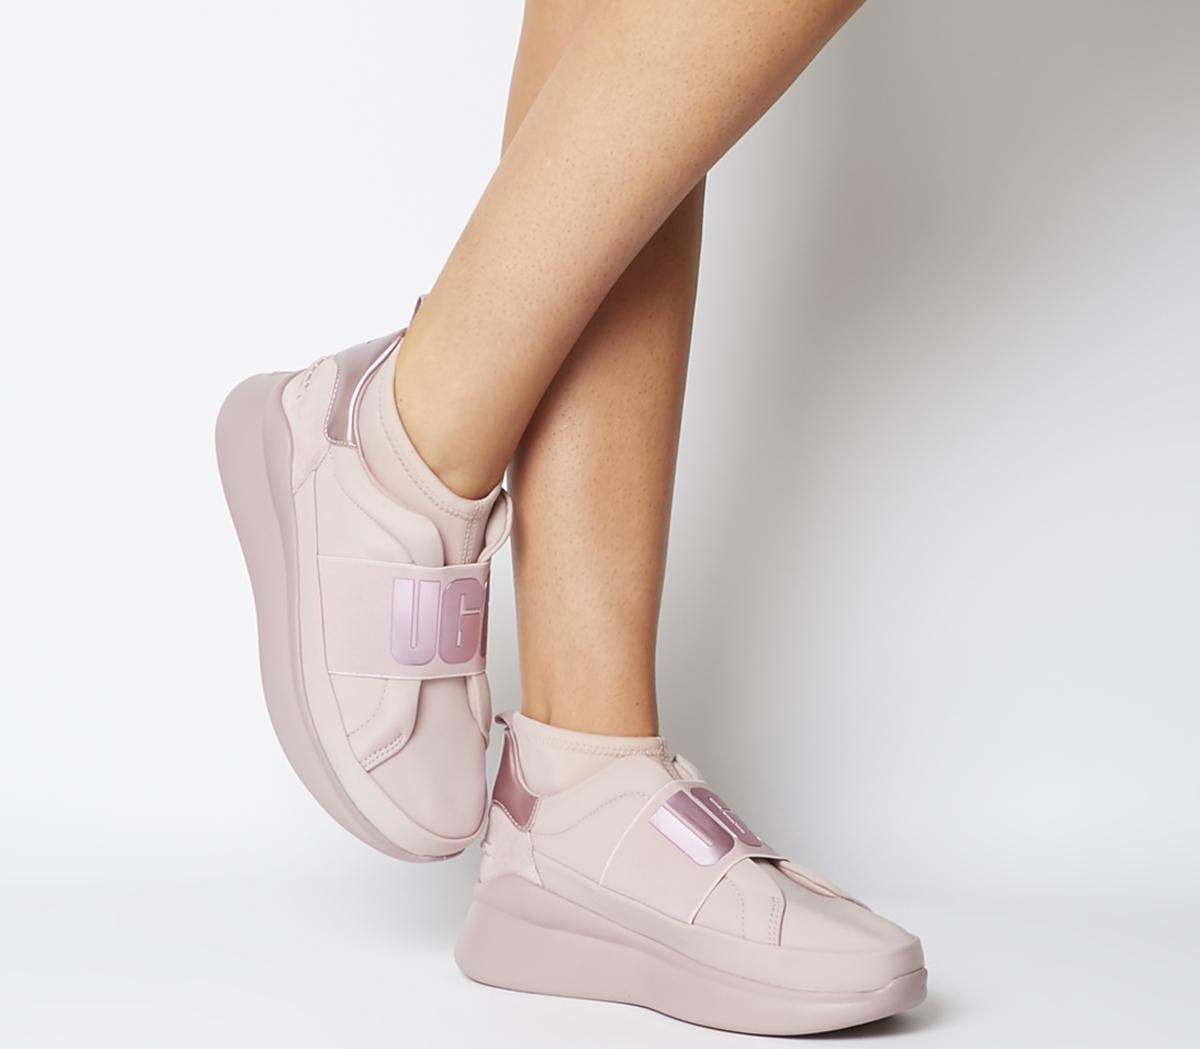 UGG Neutra Sneakers Pink Crystal